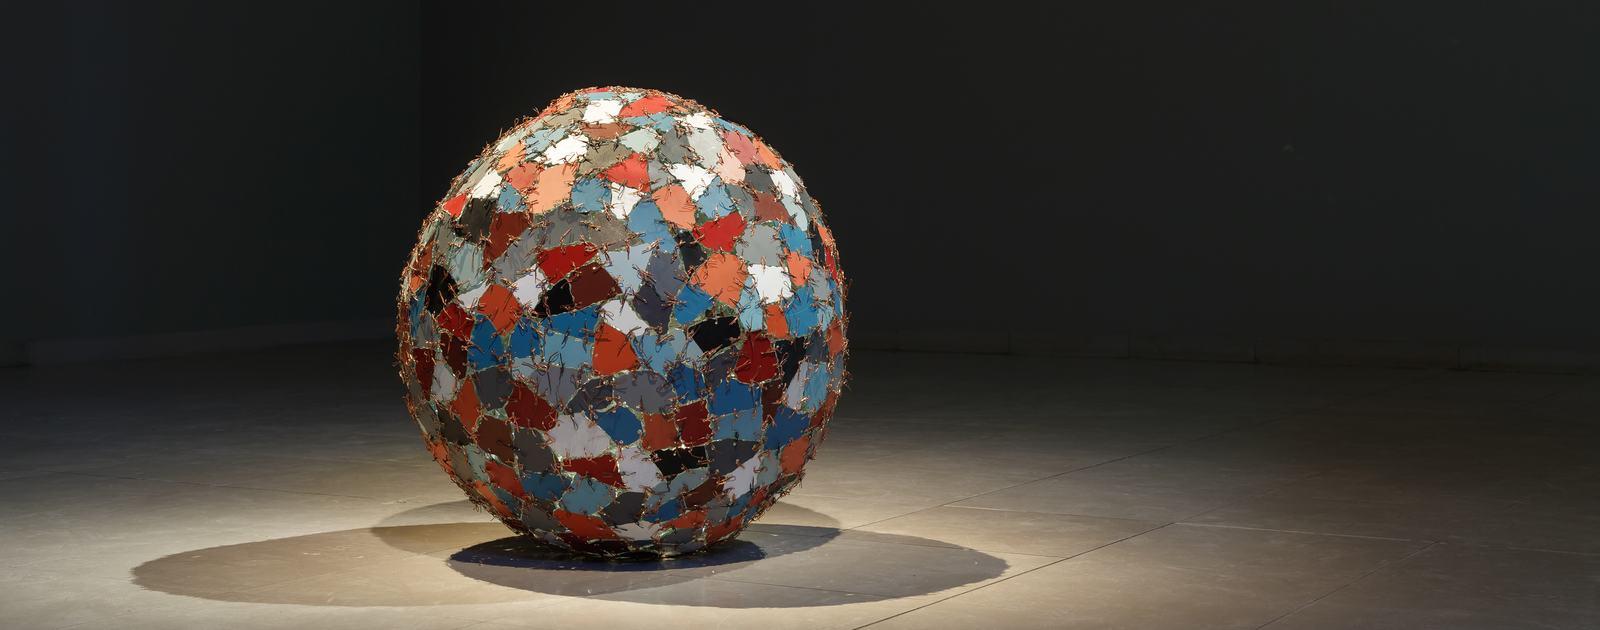 Kader Attia - Chaos + Repair = Universe, 2014